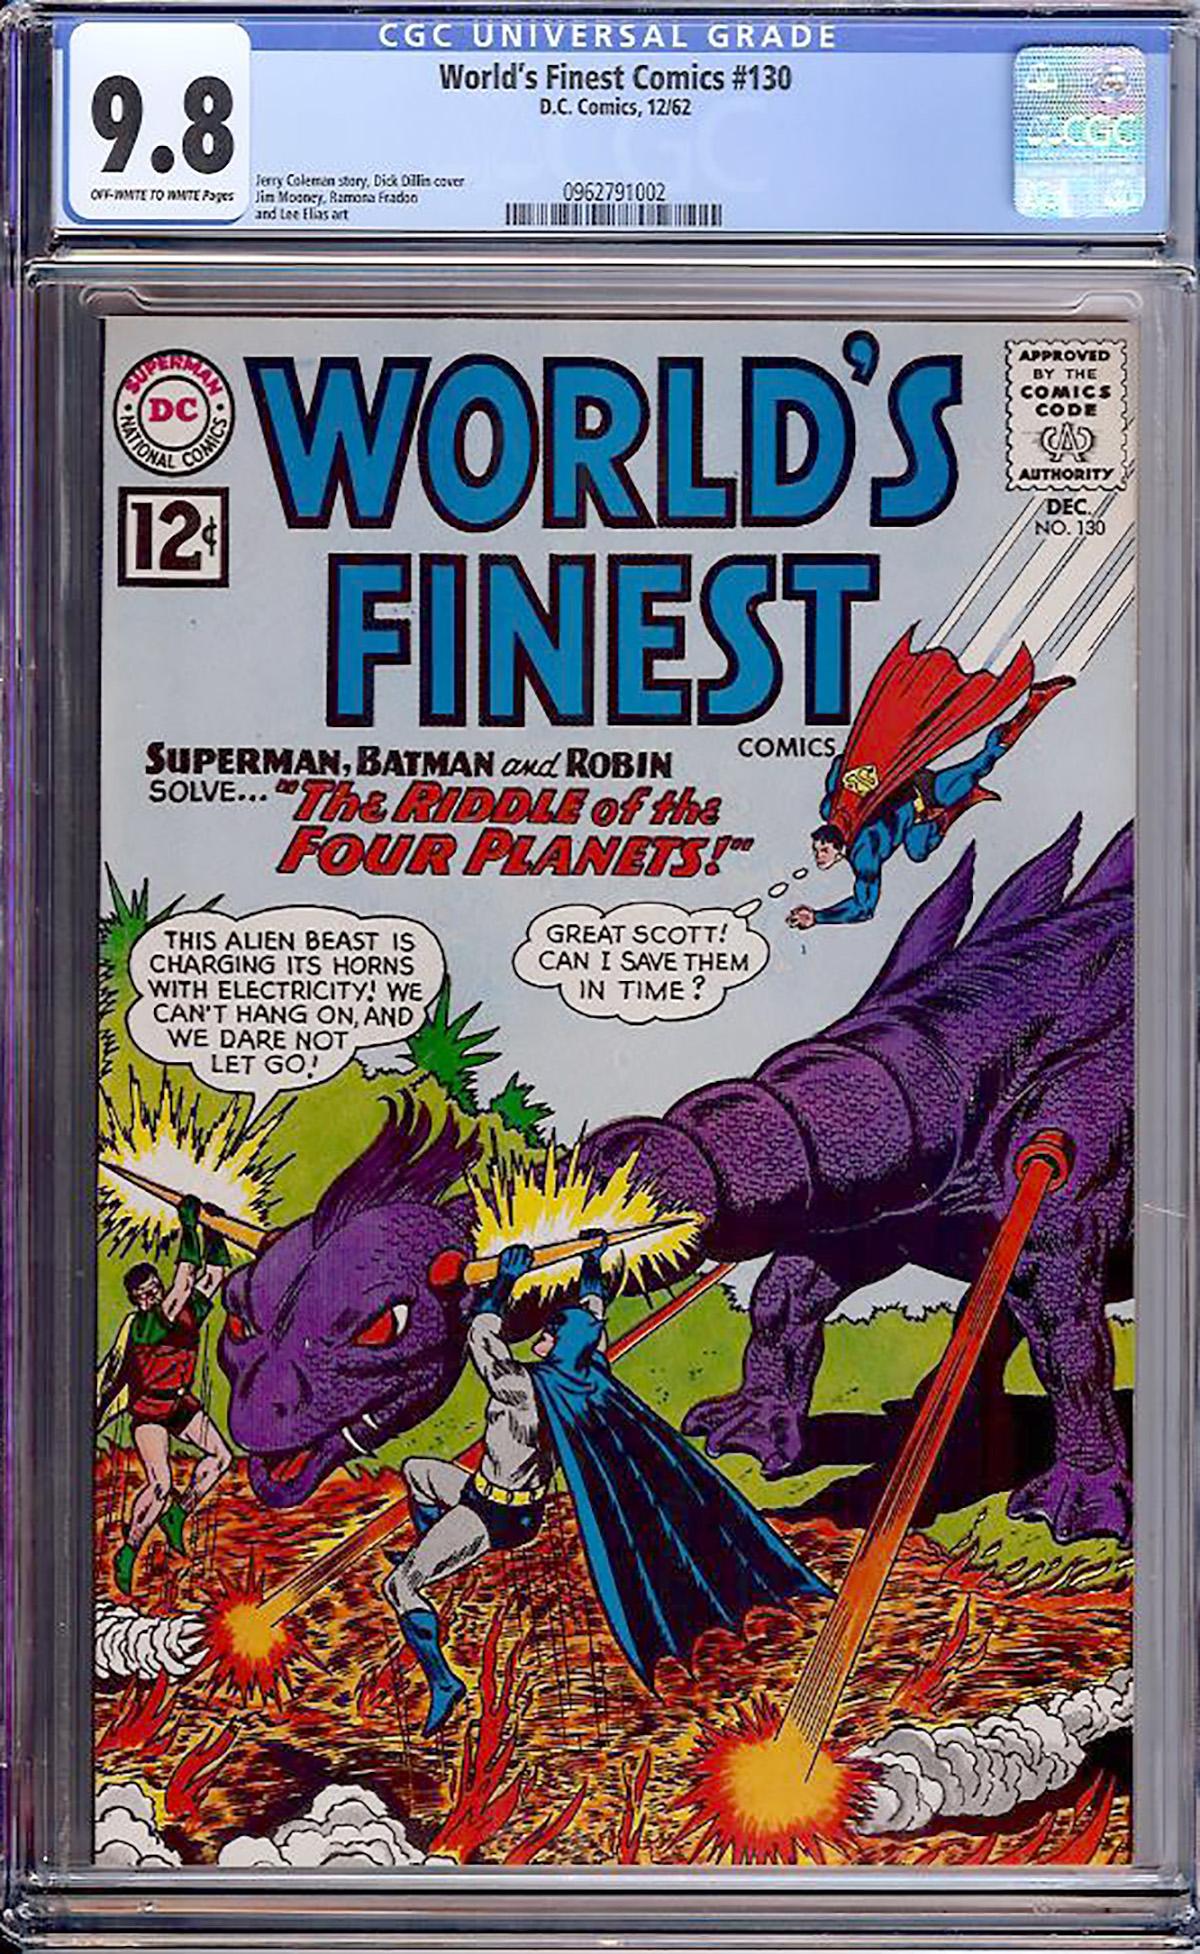 World's Finest Comics #130 CGC 9.8 ow/w